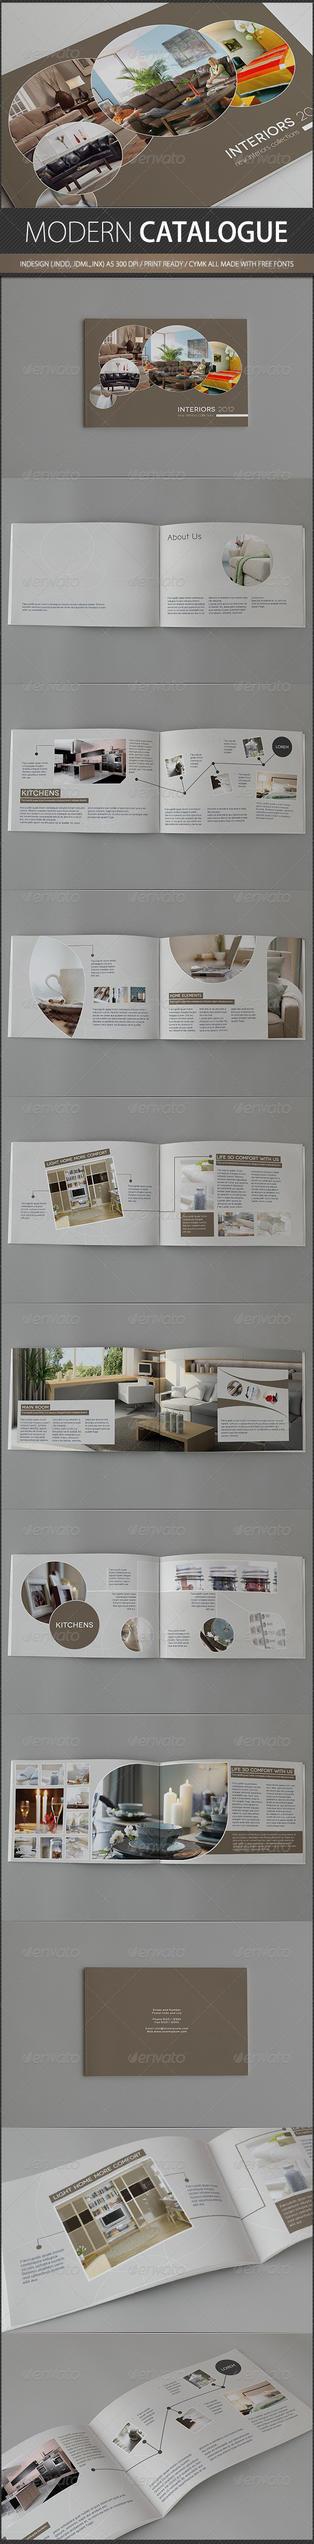 Modern Catalogue by UnicoDesign